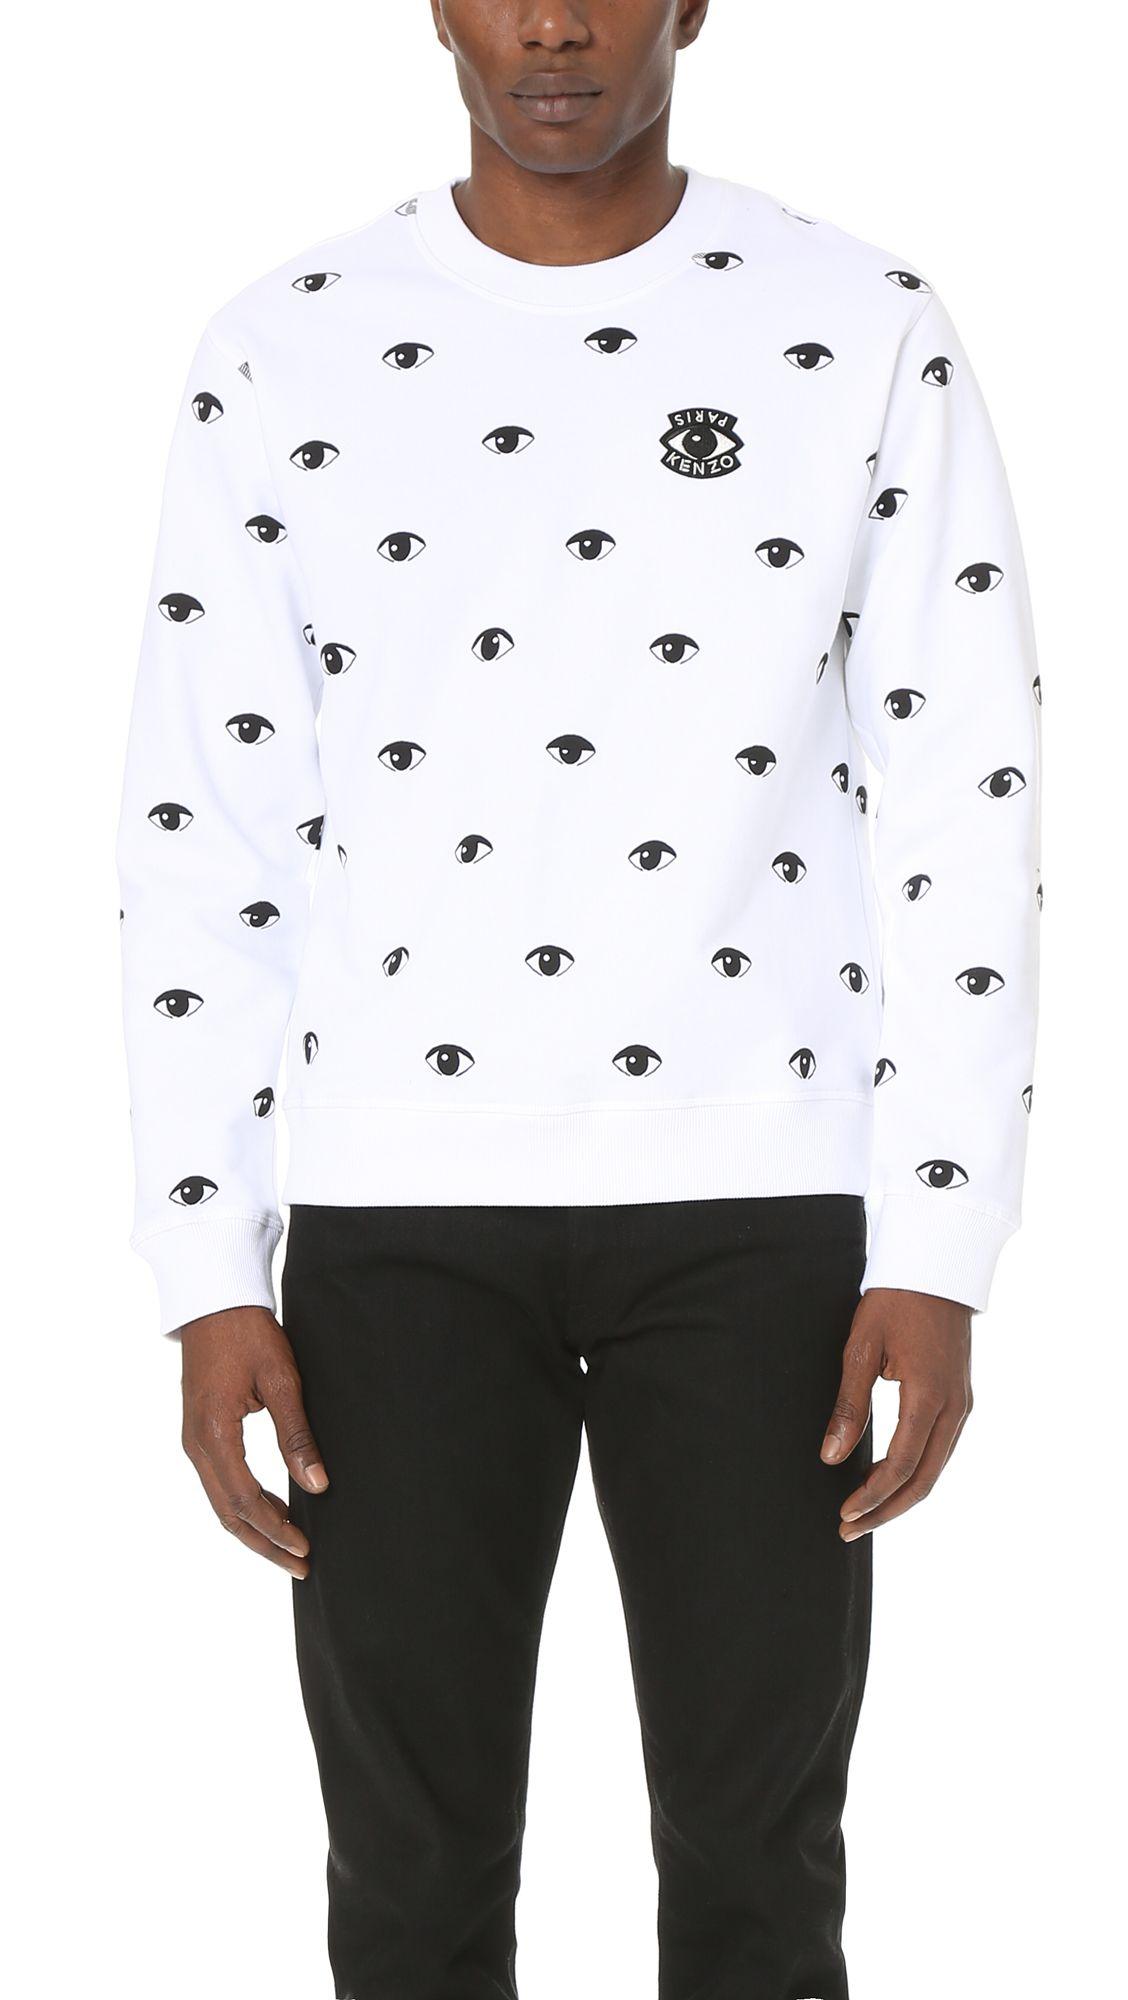 d2d5362f0bc1 KENZO Allover Eyes Print Crew Sweatshirt. #kenzo #cloth #sweatshirt ...